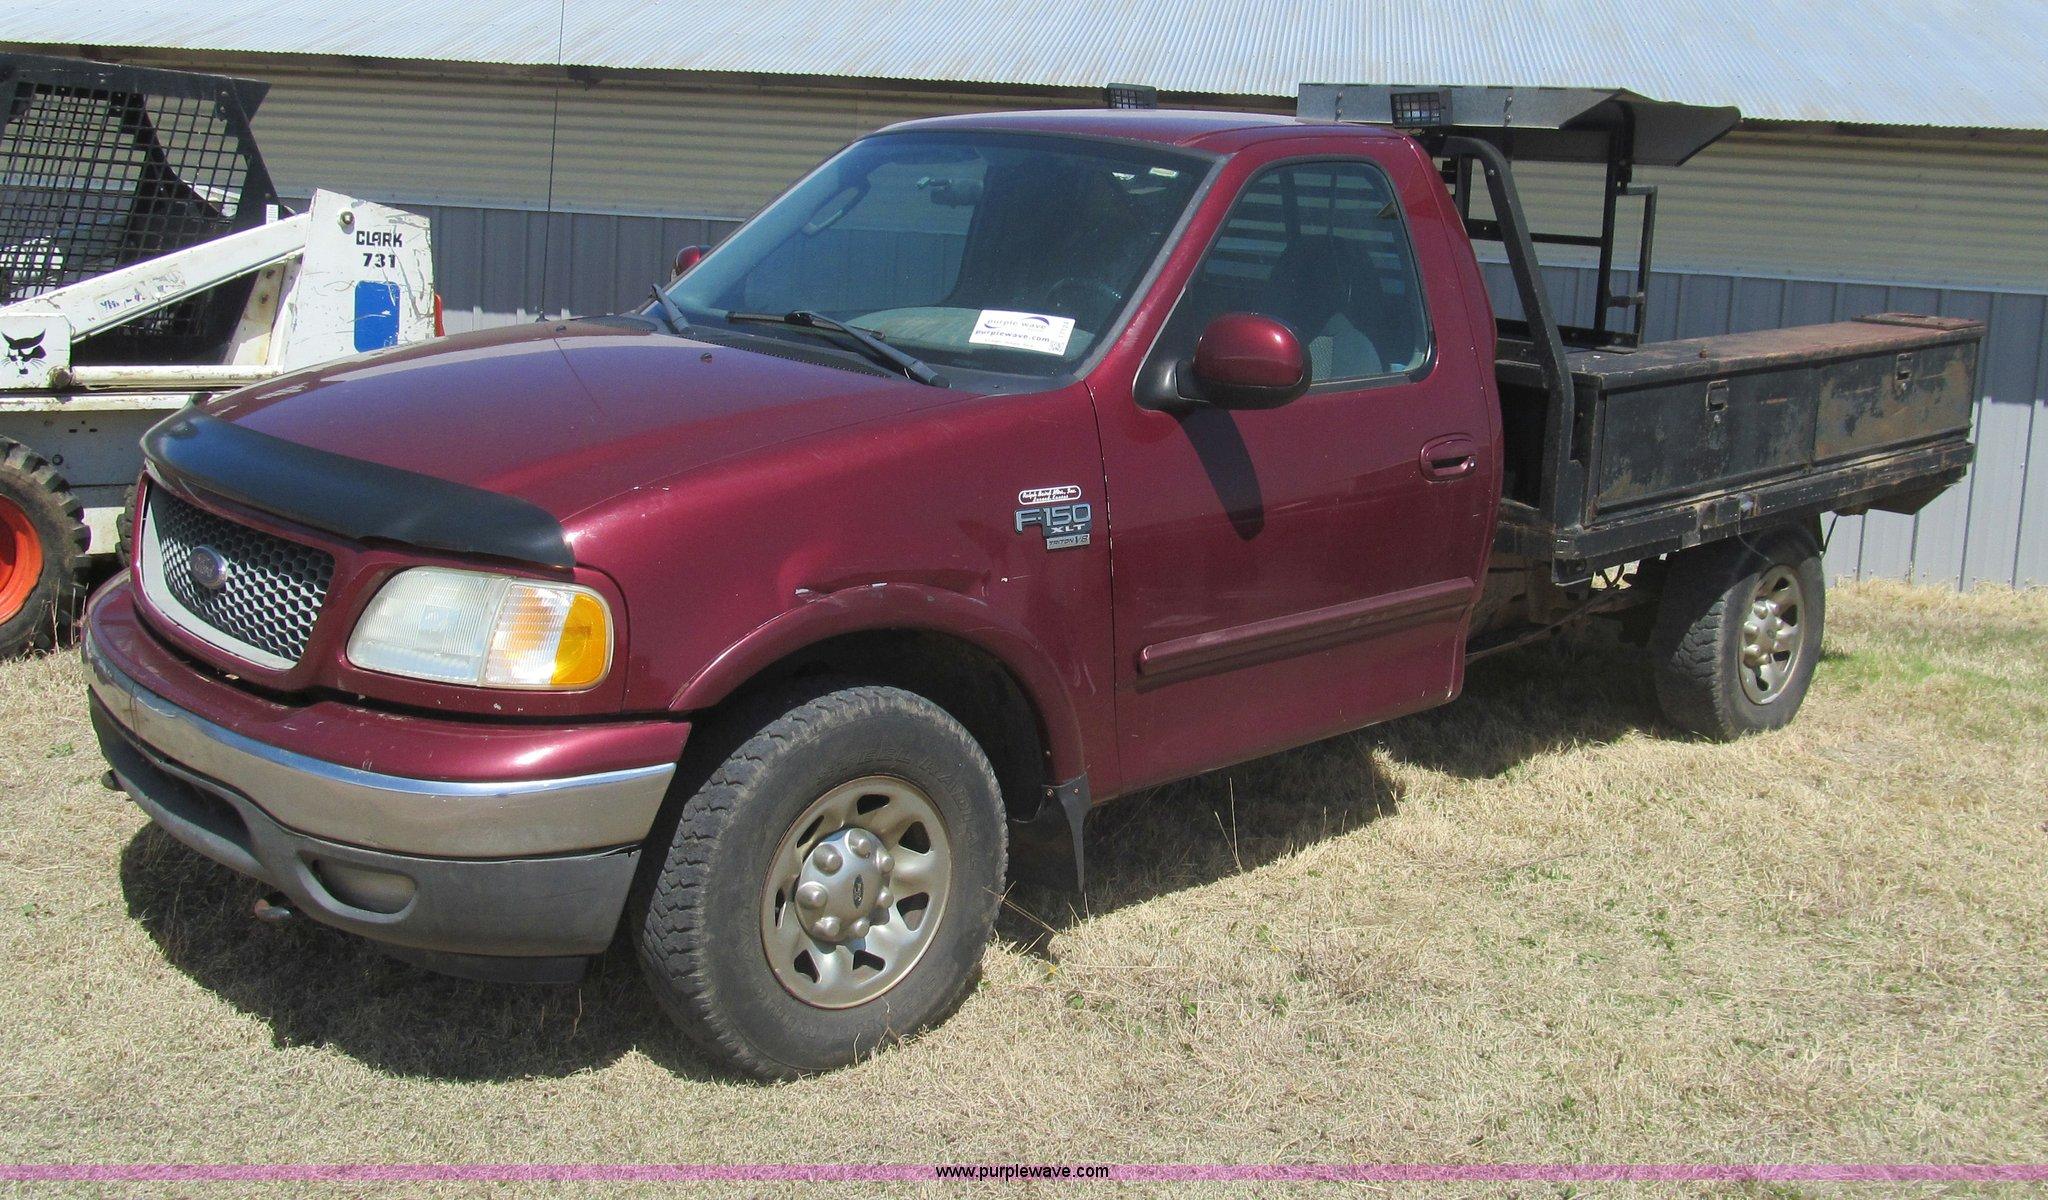 2003 Ford F150 Xlt Flatbed Pickup Truck Item I7124 Sold